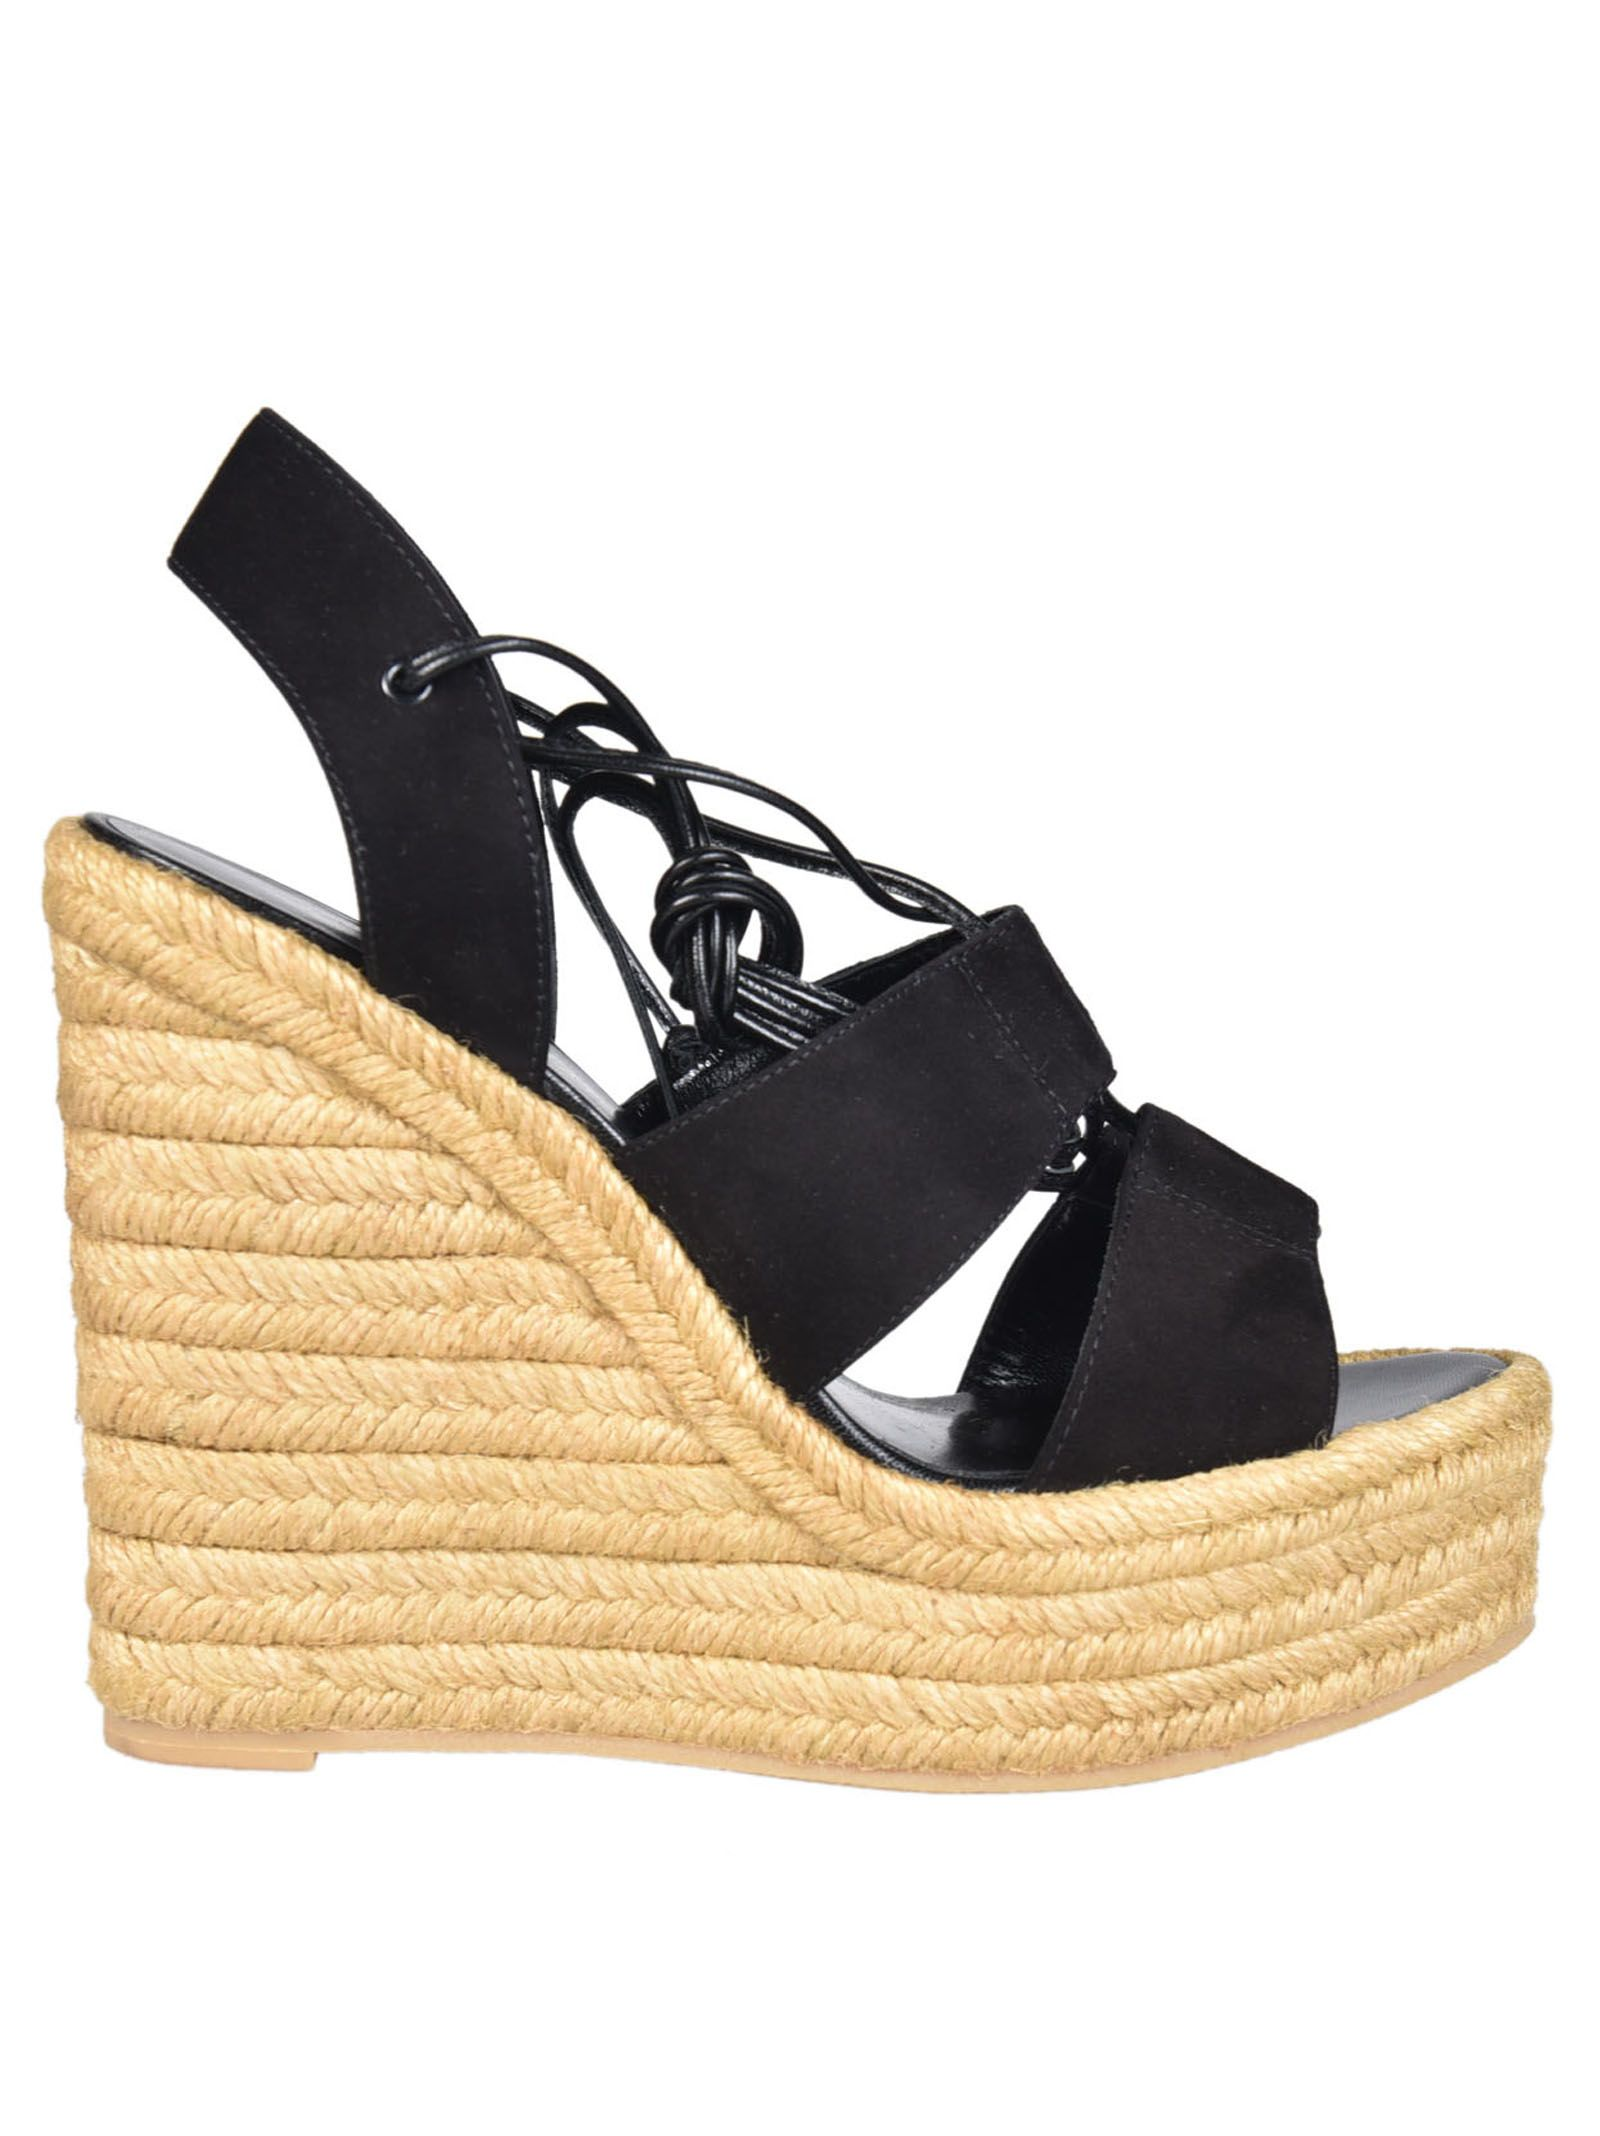 0f0318fad6f Saint Laurent Saint Laurent Espadrille Wedge Sandals - Black ...